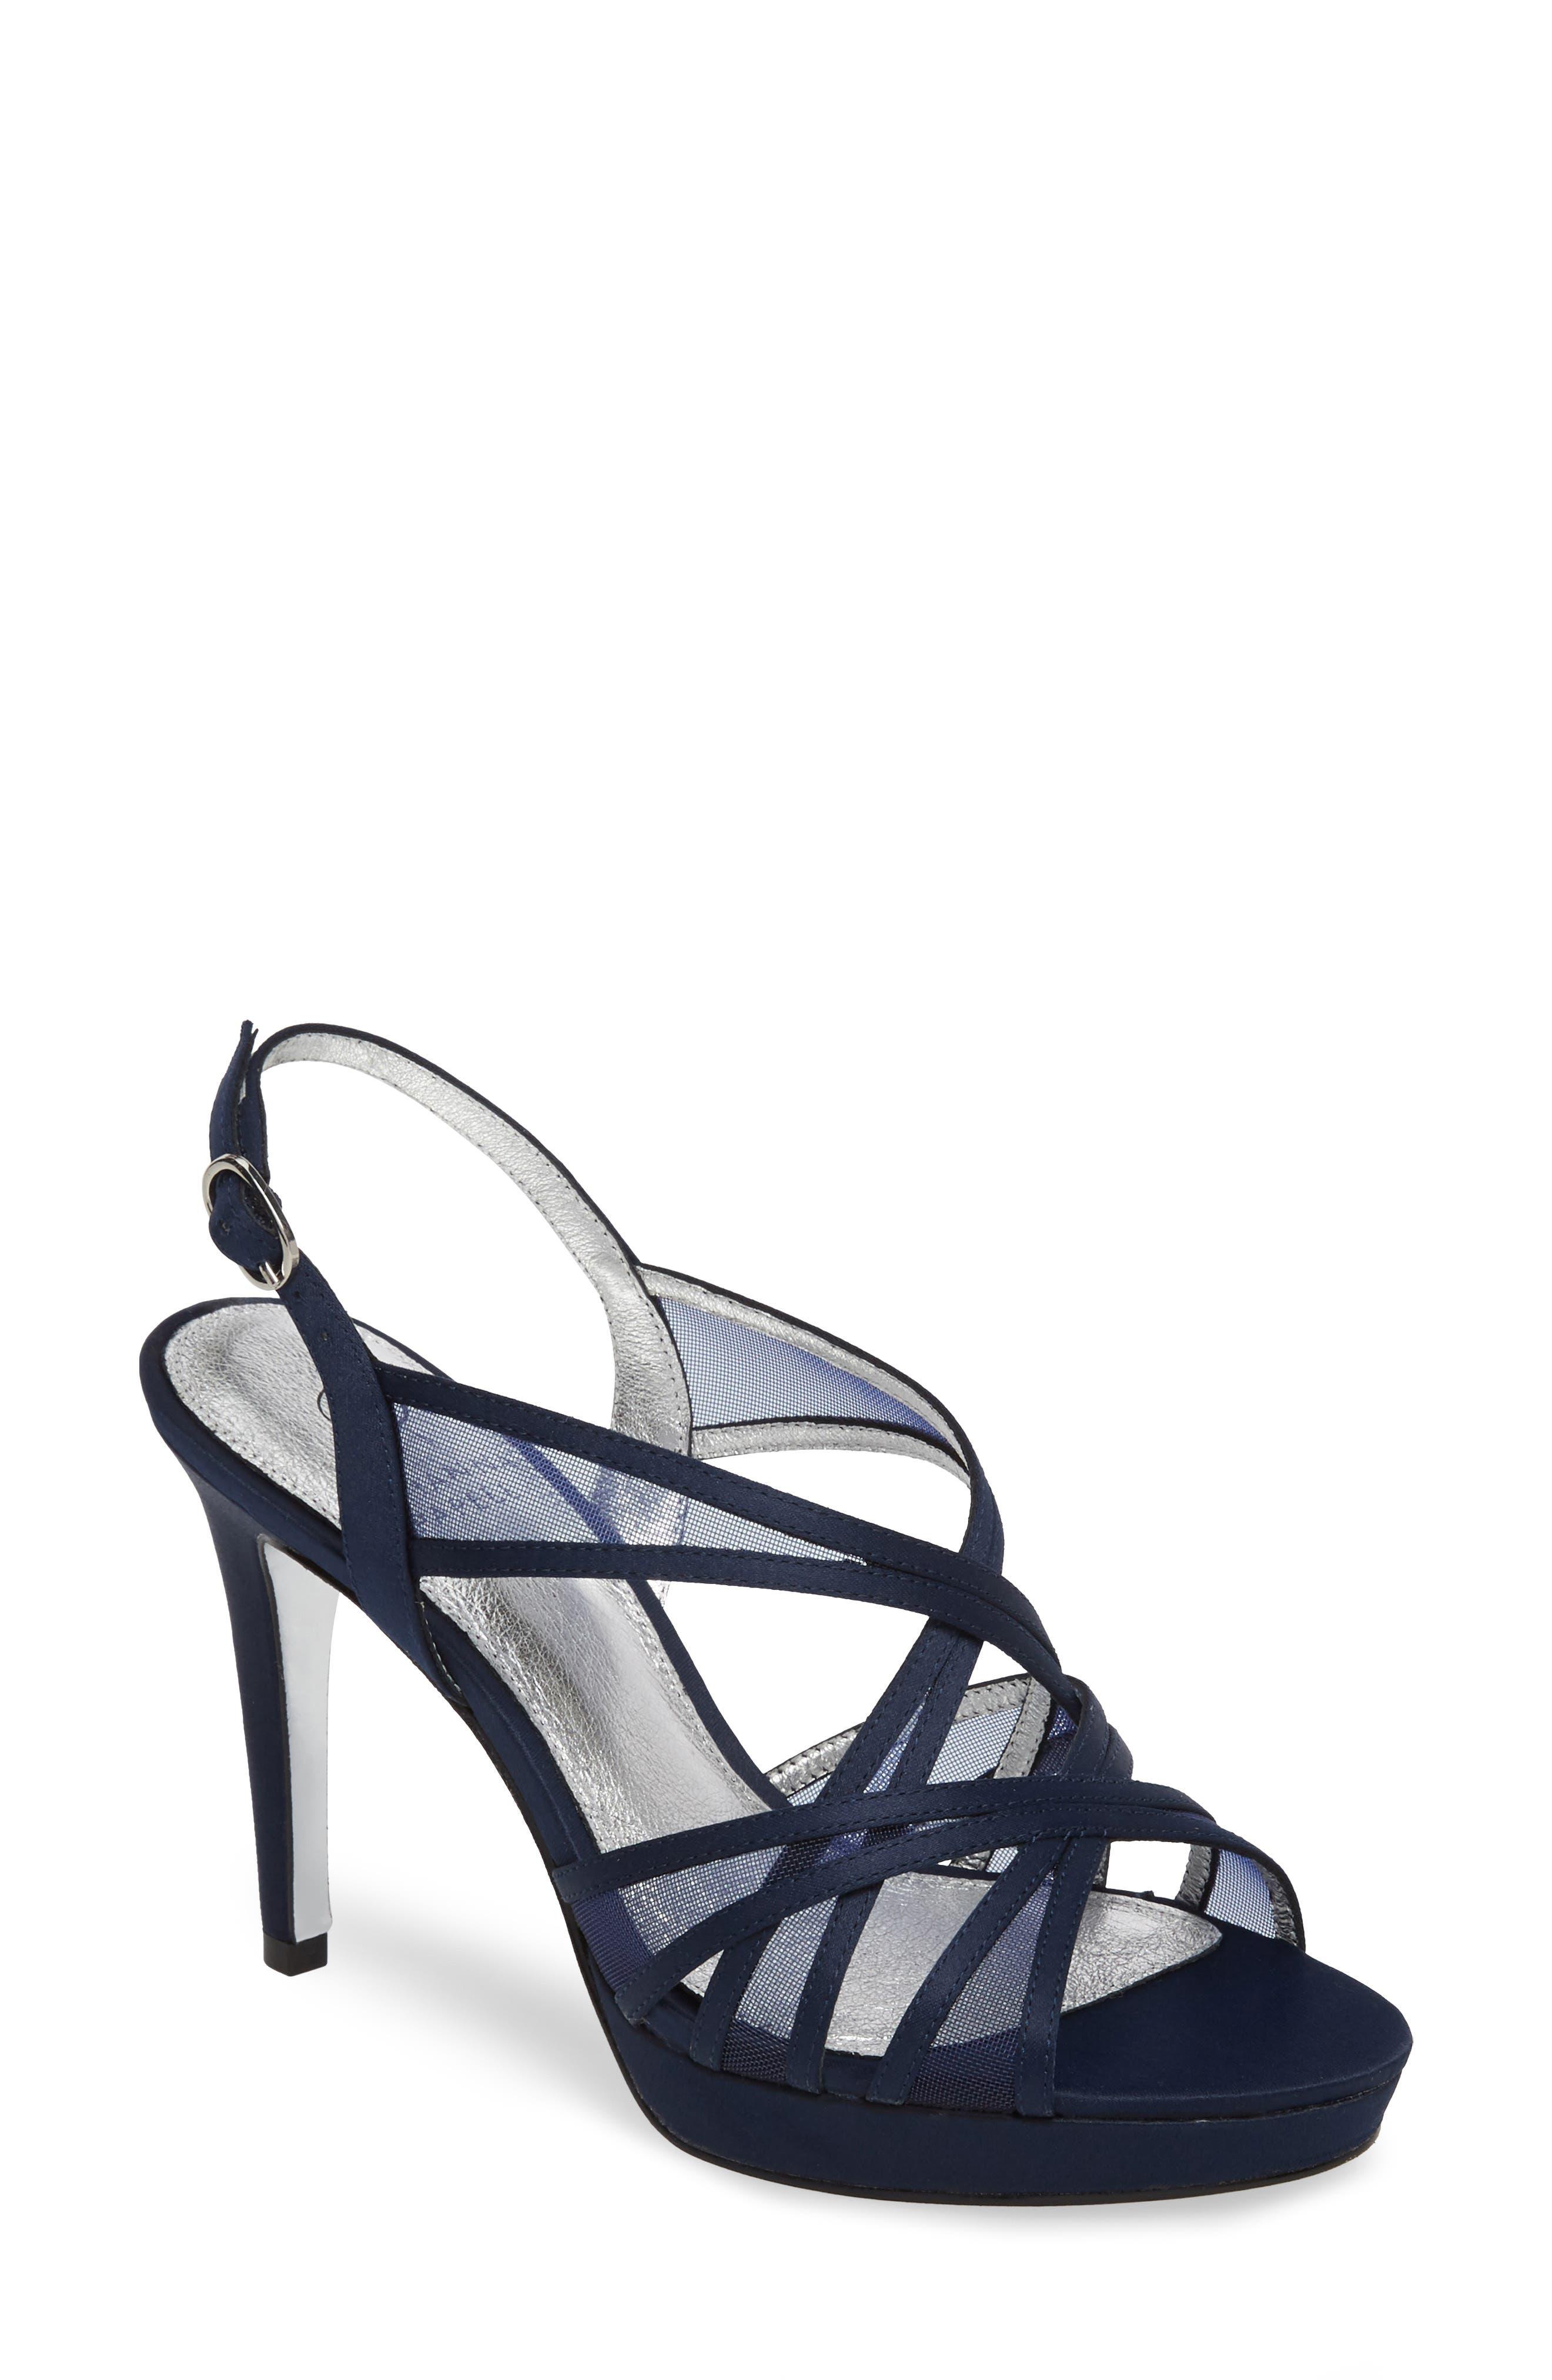 Adrianna Papell Adri Platform Sandal, Blue